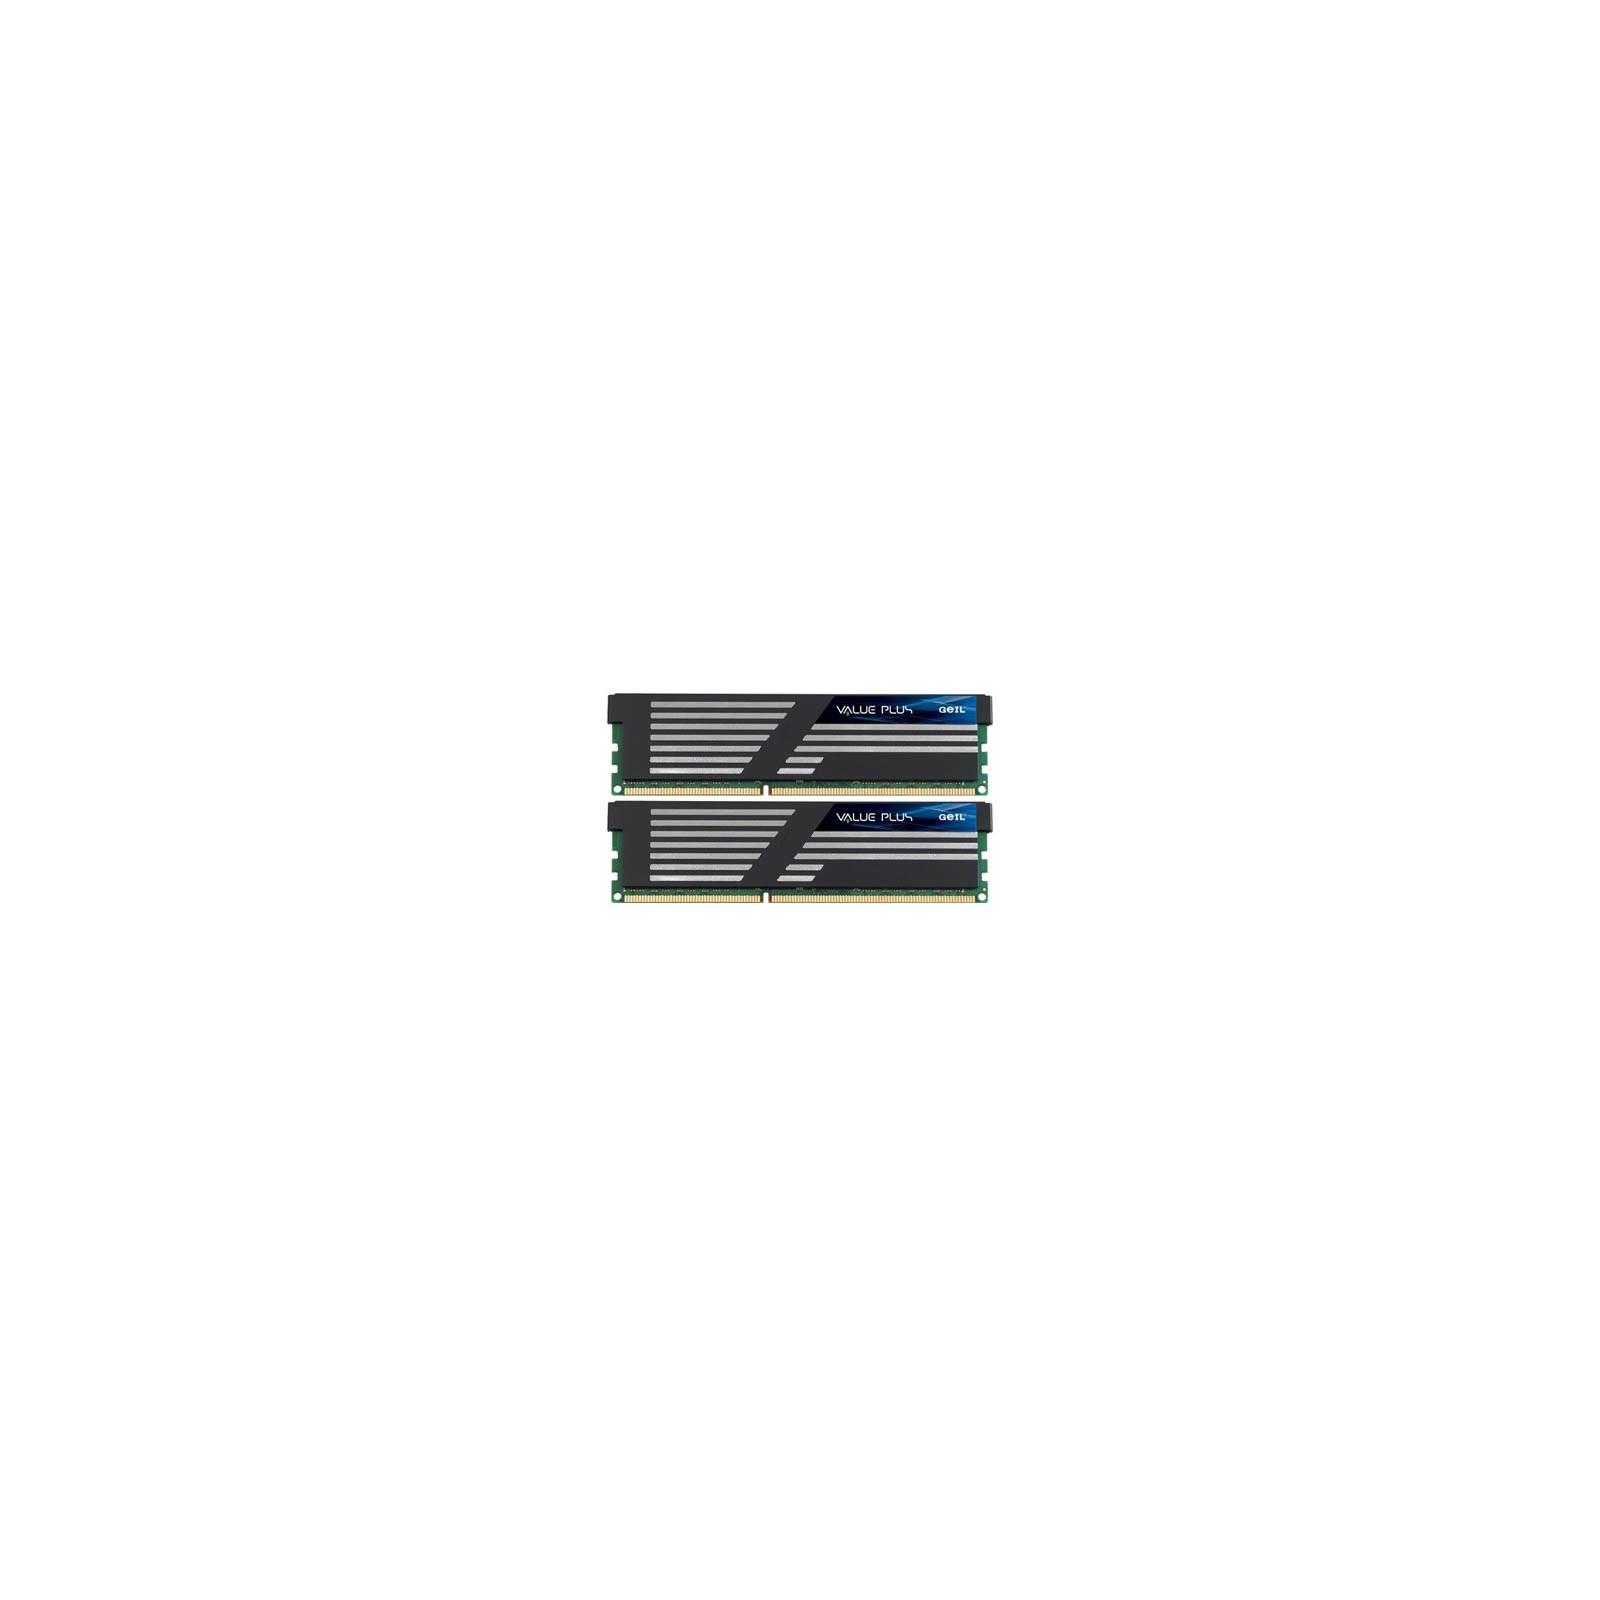 Модуль памяти для компьютера DDR3 16GB (2x8GB) 1600 MHz GEIL (GVP316GB1600C10D)